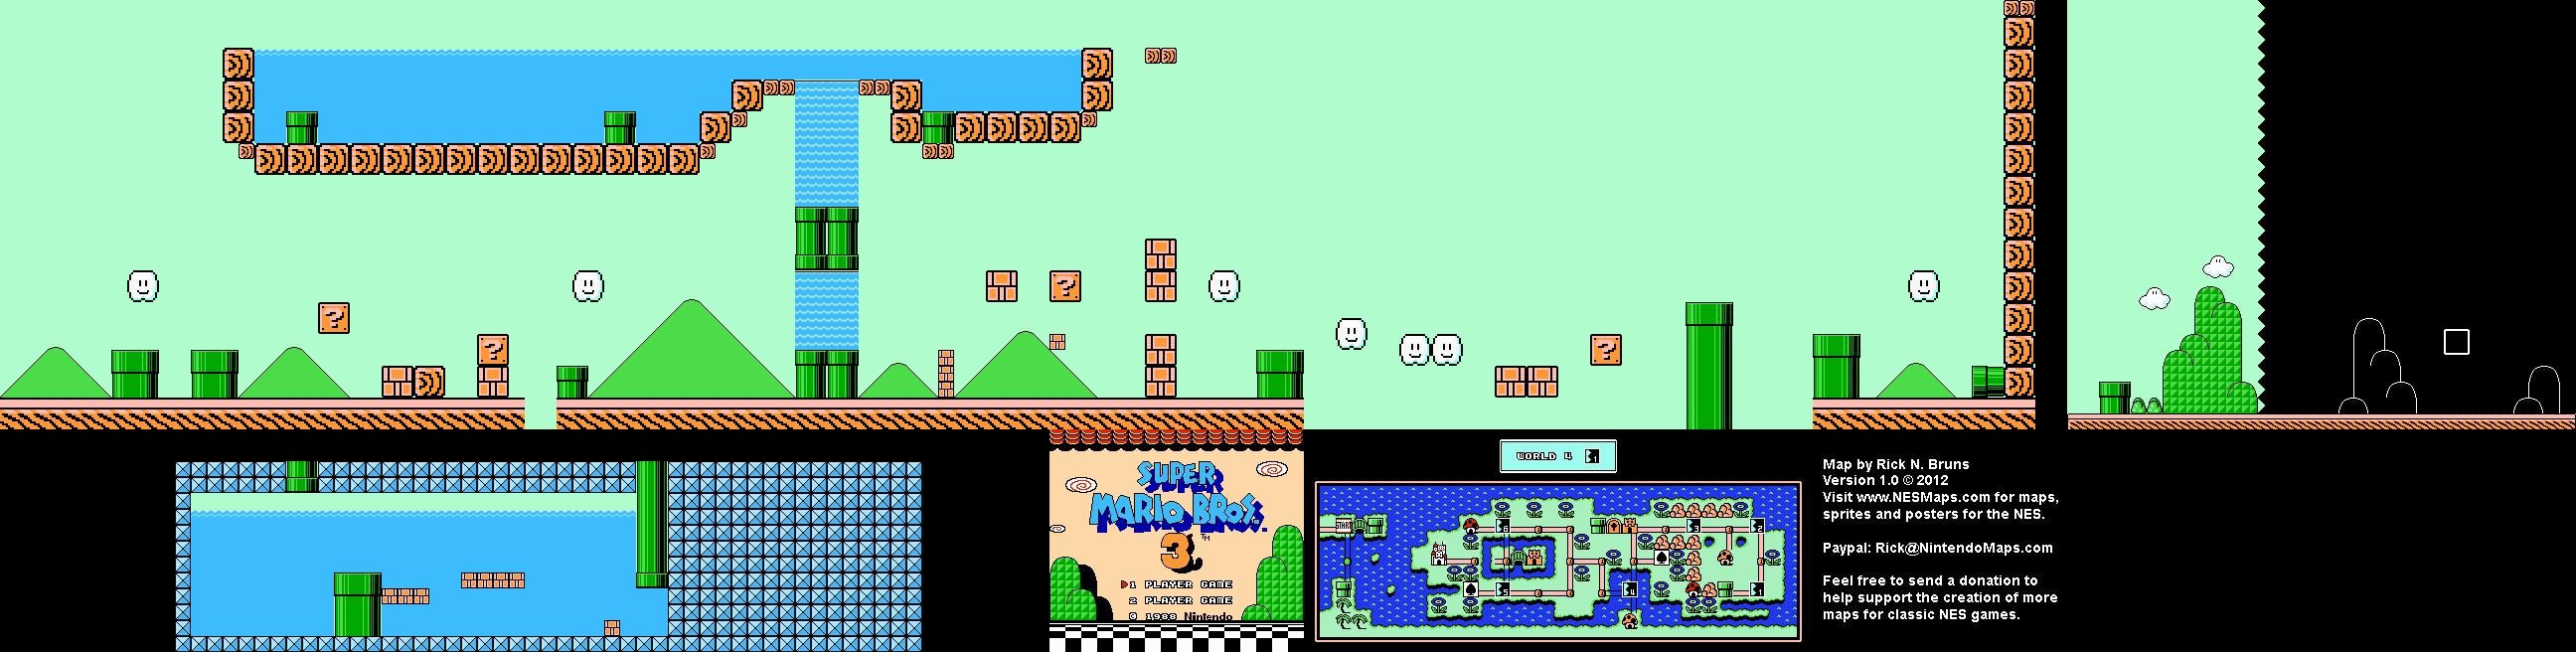 Super Mario Brothers 3 World 4 1 Nintendo Nes Map Bg